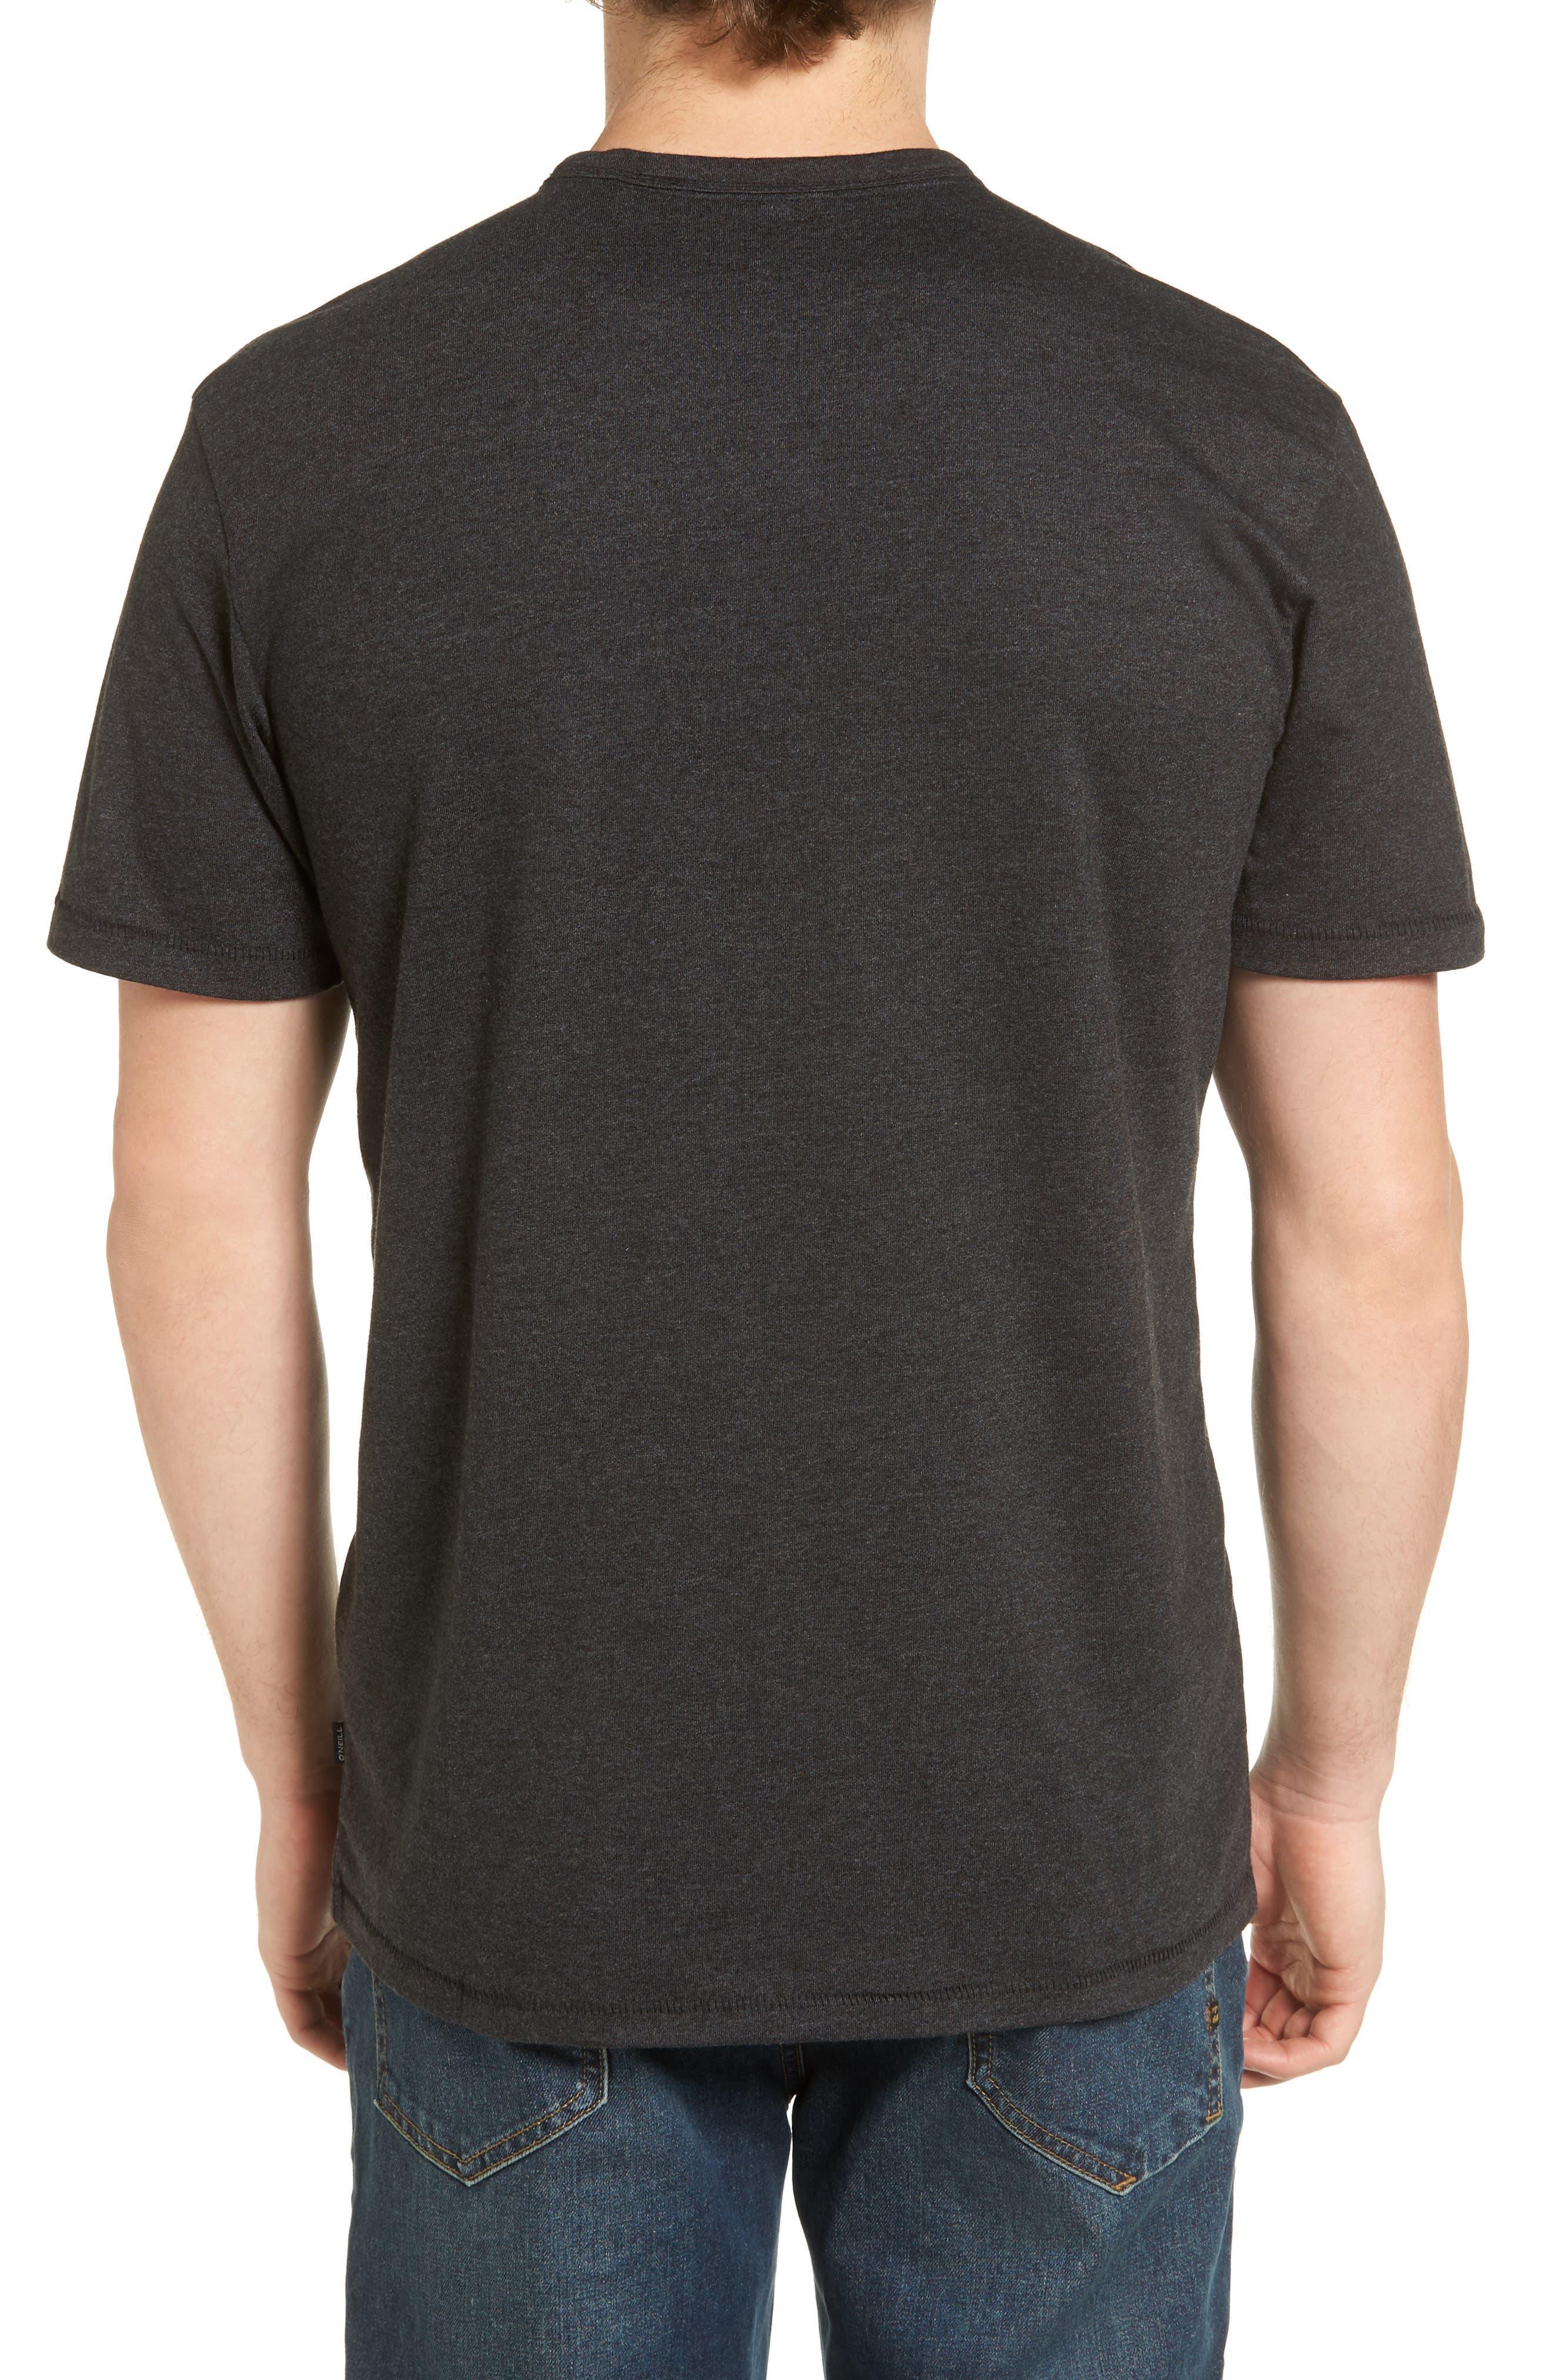 Rodgers Striped Pocket T-Shirt,                             Alternate thumbnail 2, color,                             001